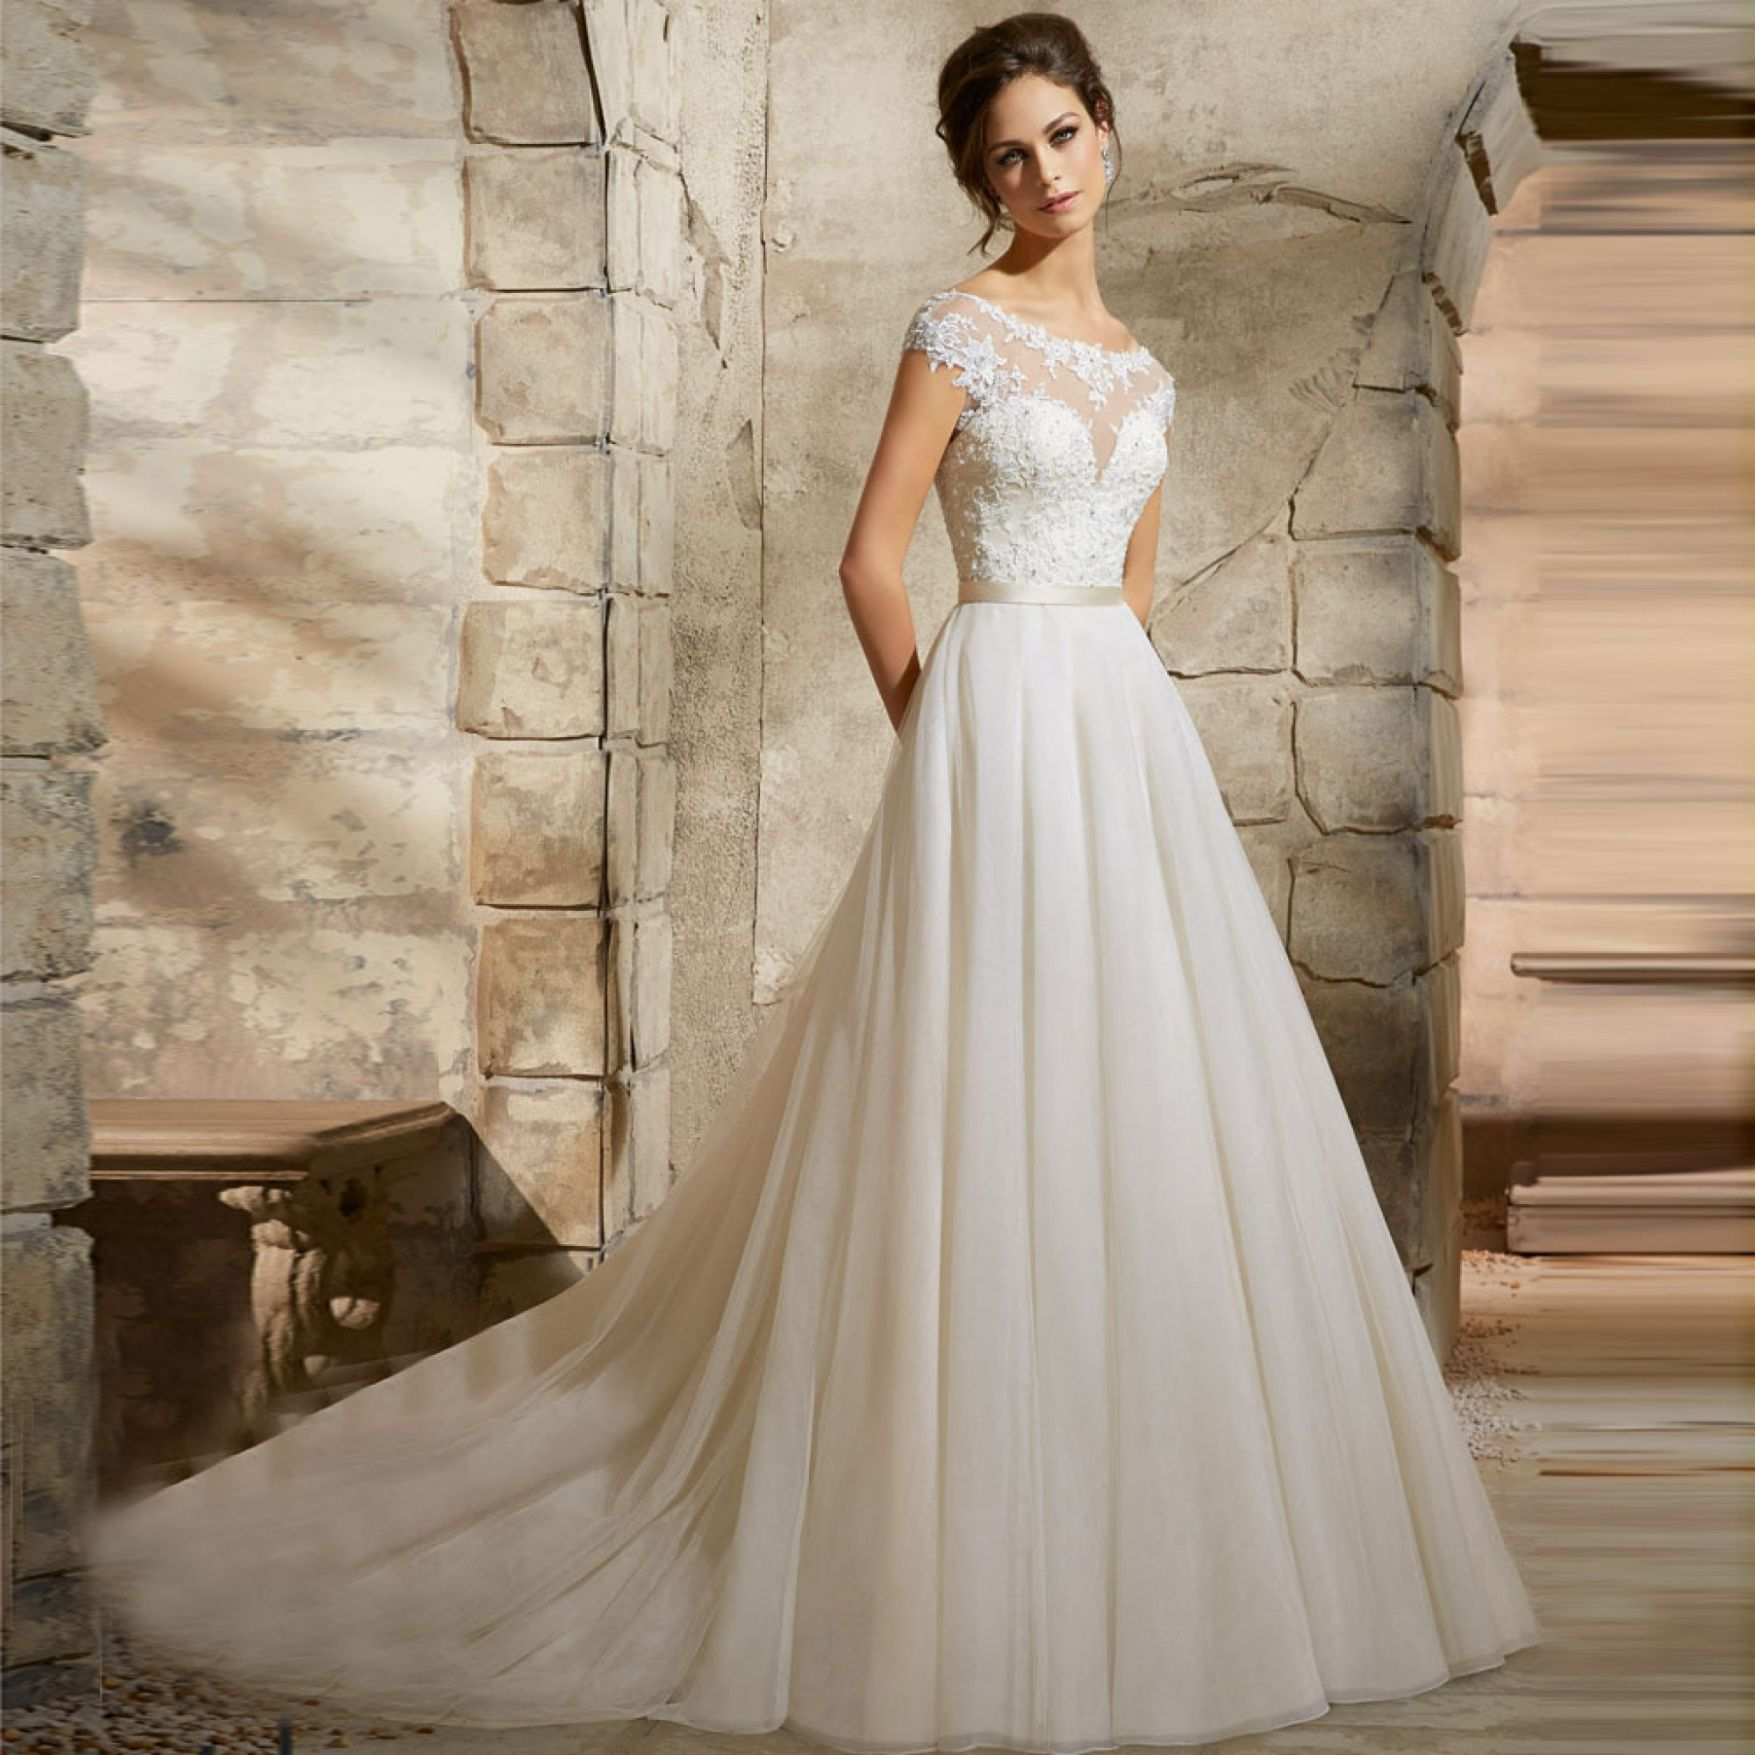 Big girl wedding dresses   Cheap Big Girl Wedding Dresses  Cute Dresses for A Wedding